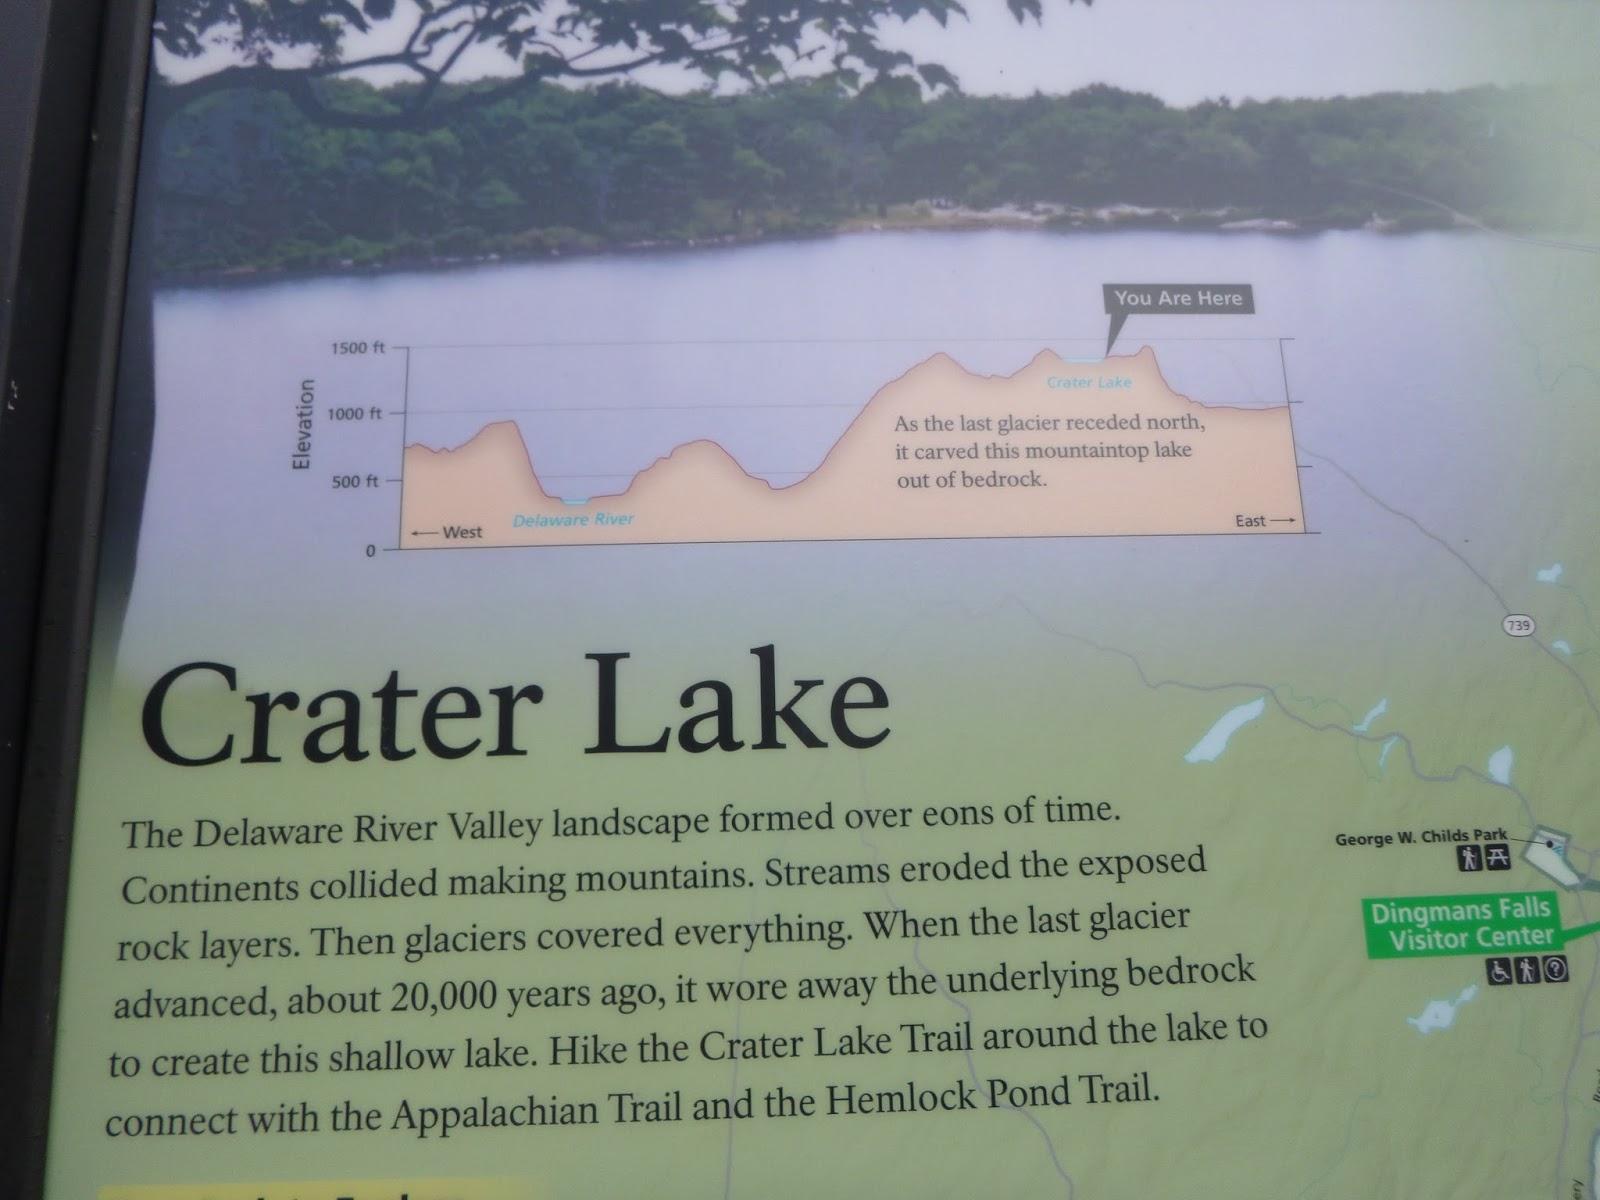 Appalachian Trail Virginia Map And Us 460 - chicagohotdogs.info